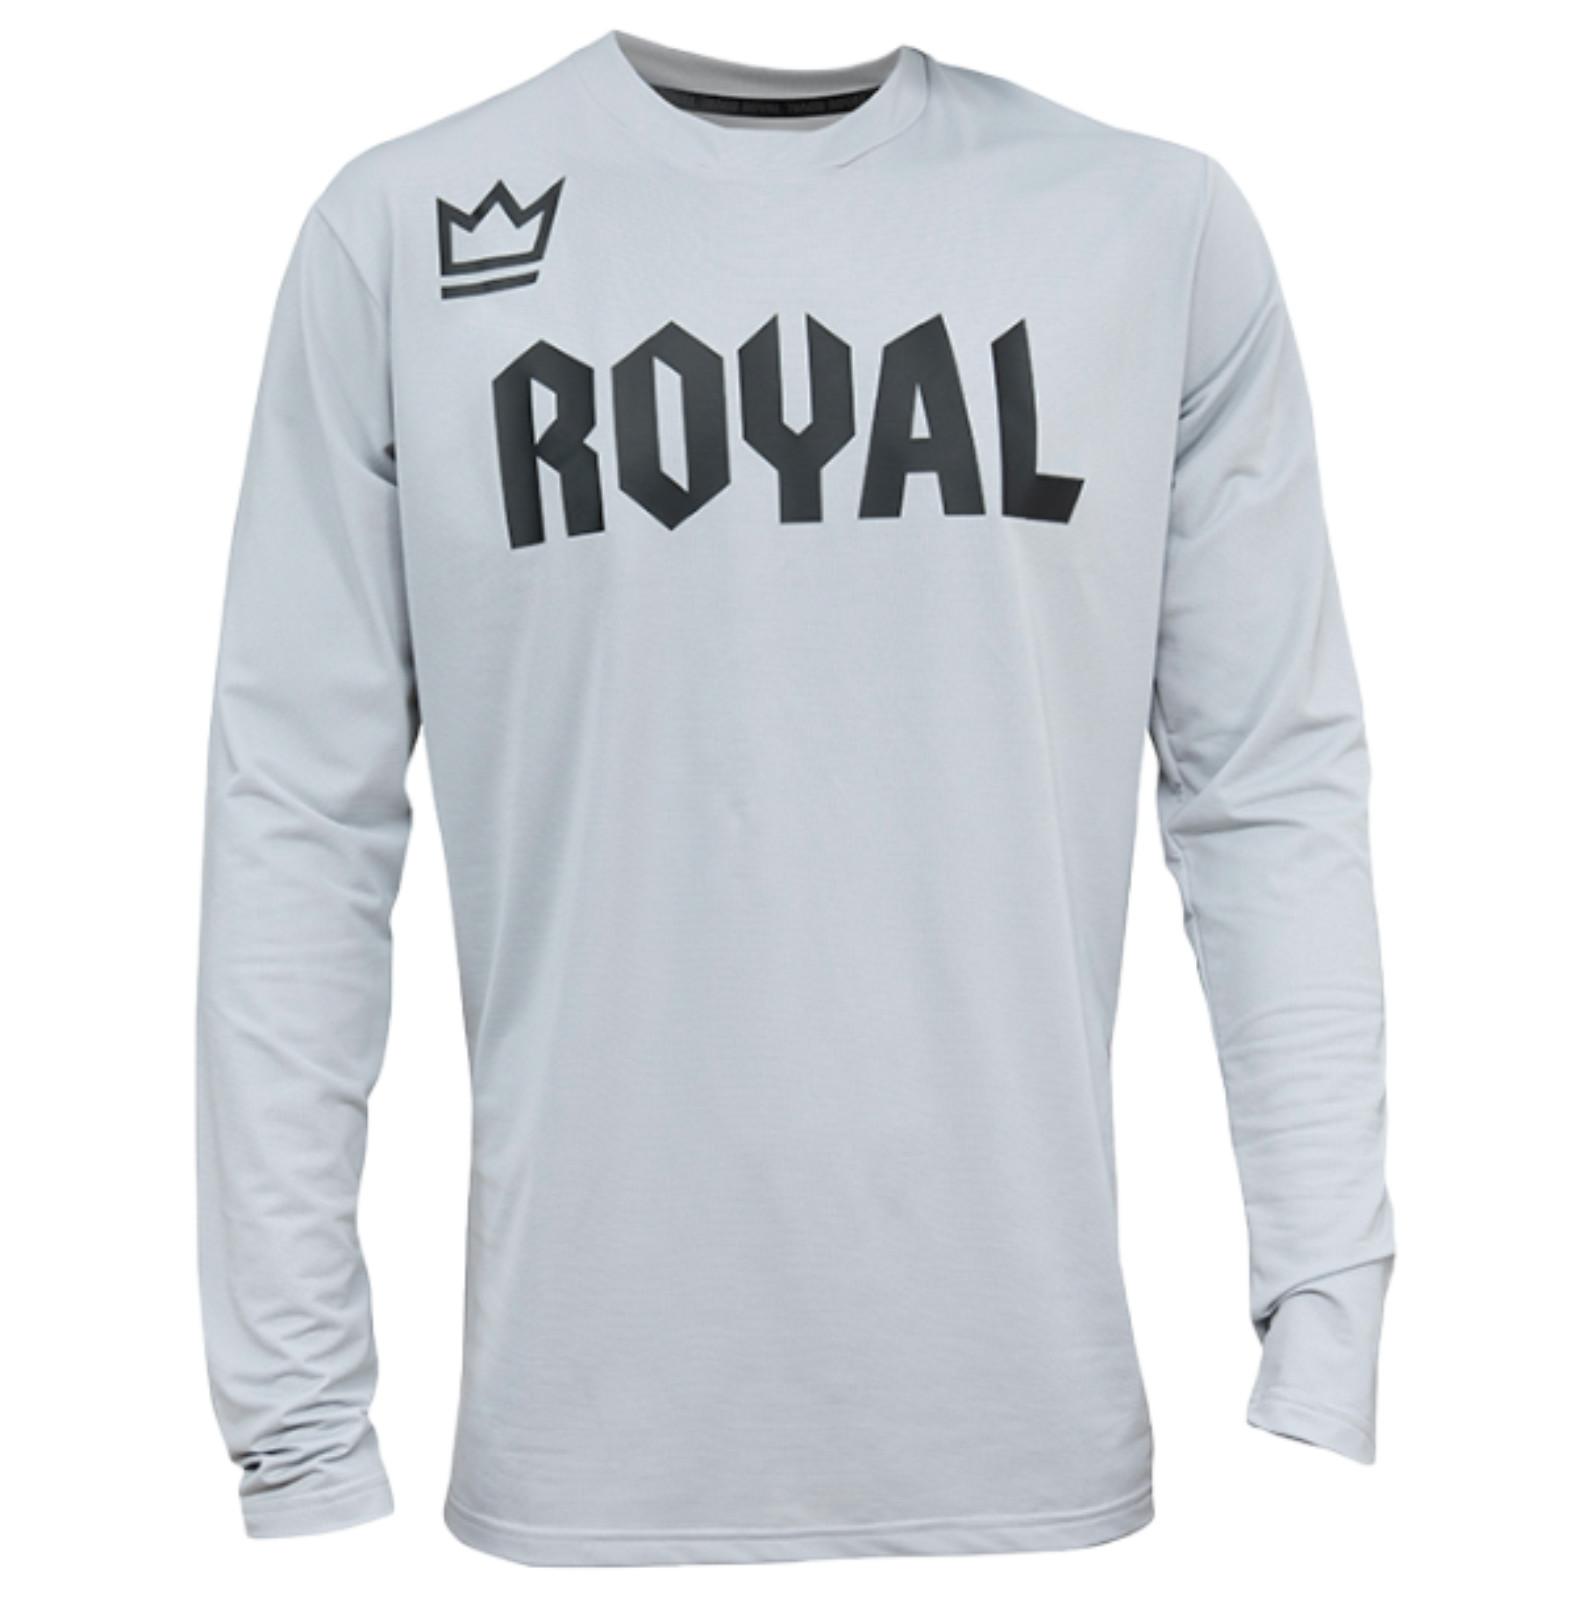 Royal 2020 Race Riding Jersey - Grey